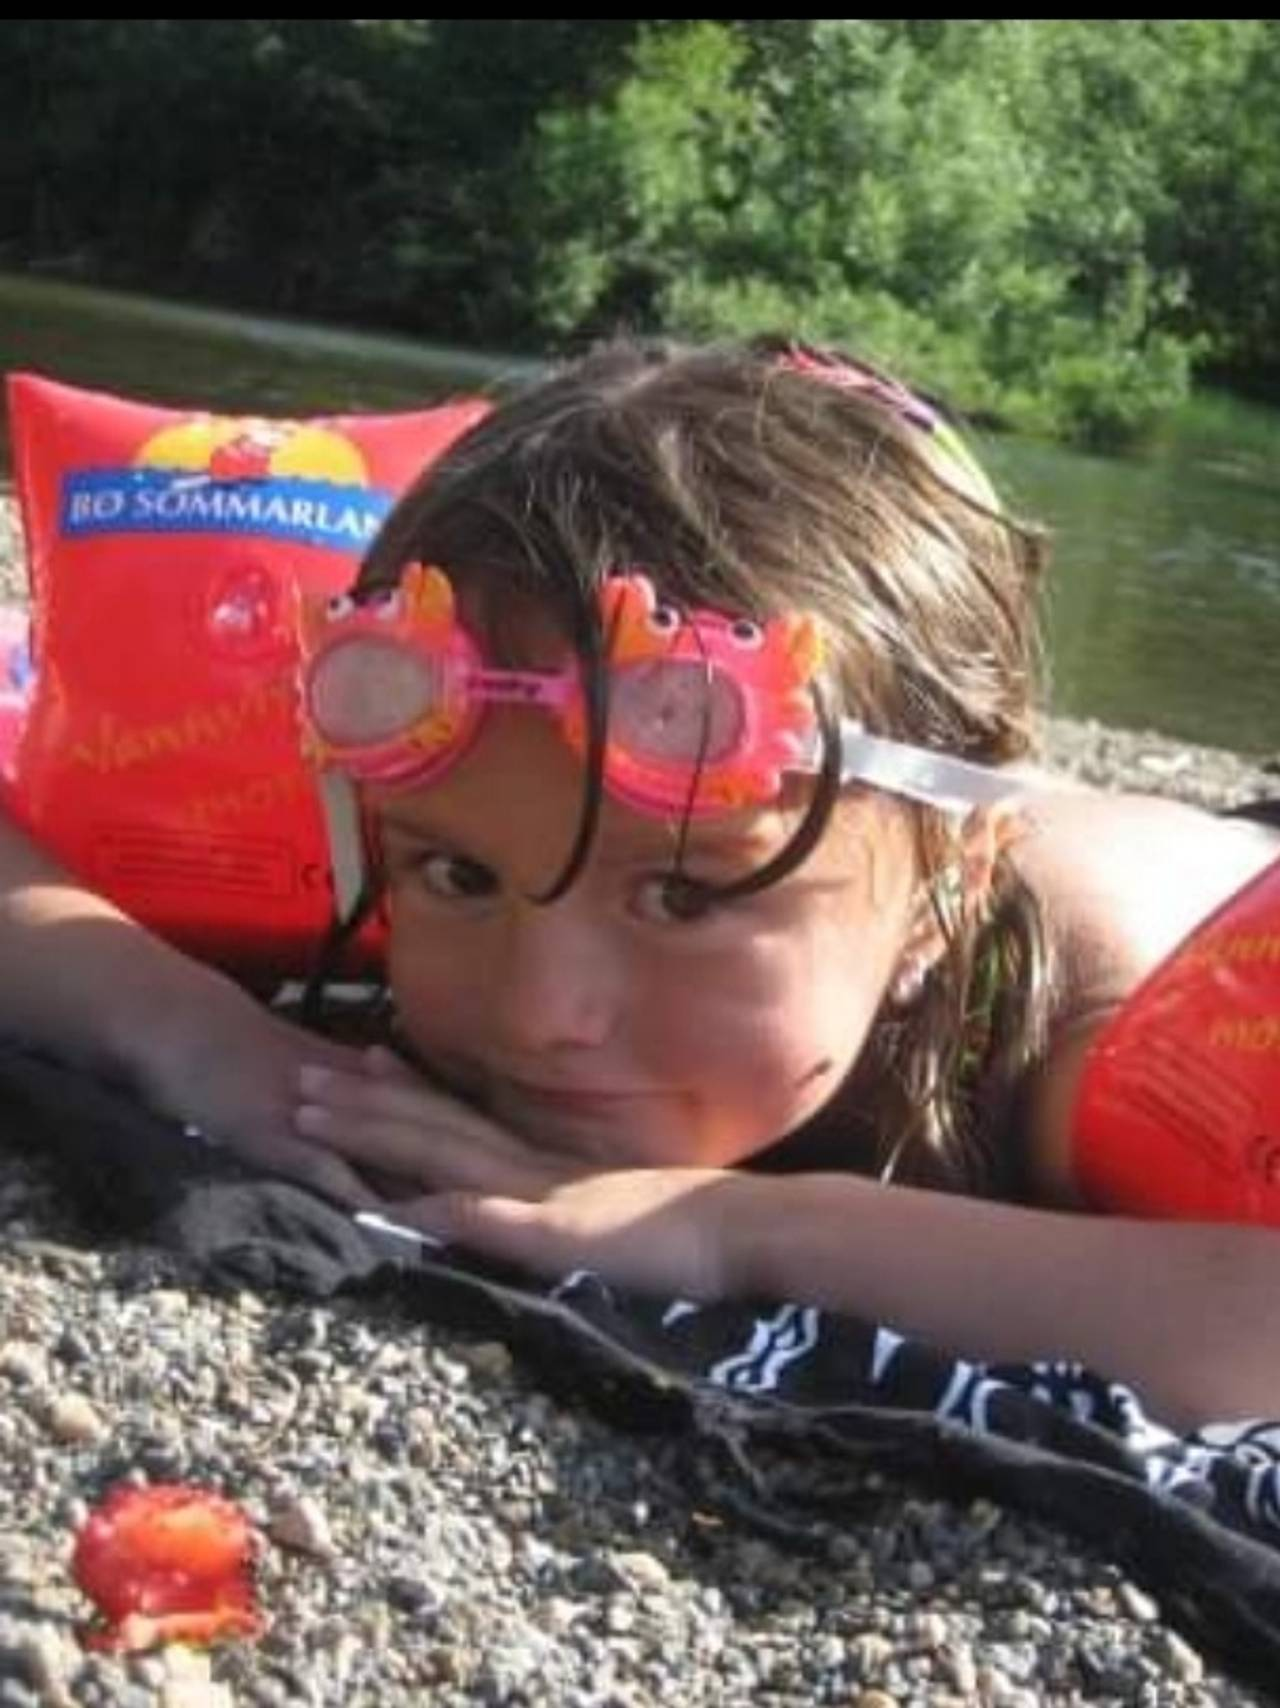 Andrine ligger på stranden med baderinger og svømmebriller.